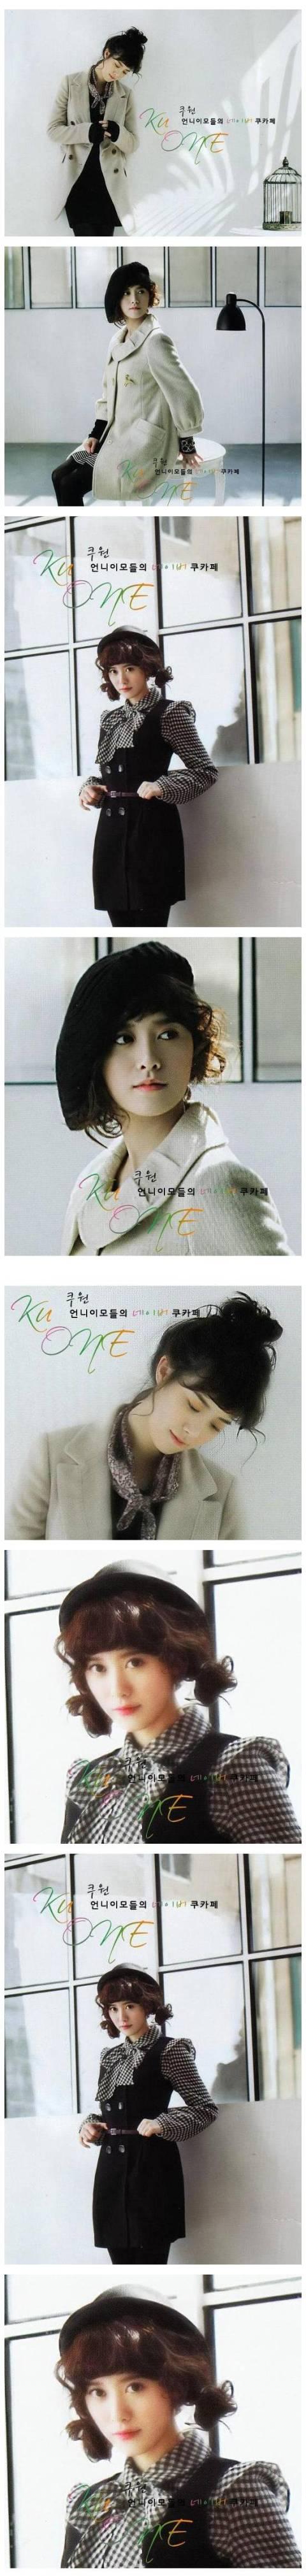 KOO HYE-SOON28OKT